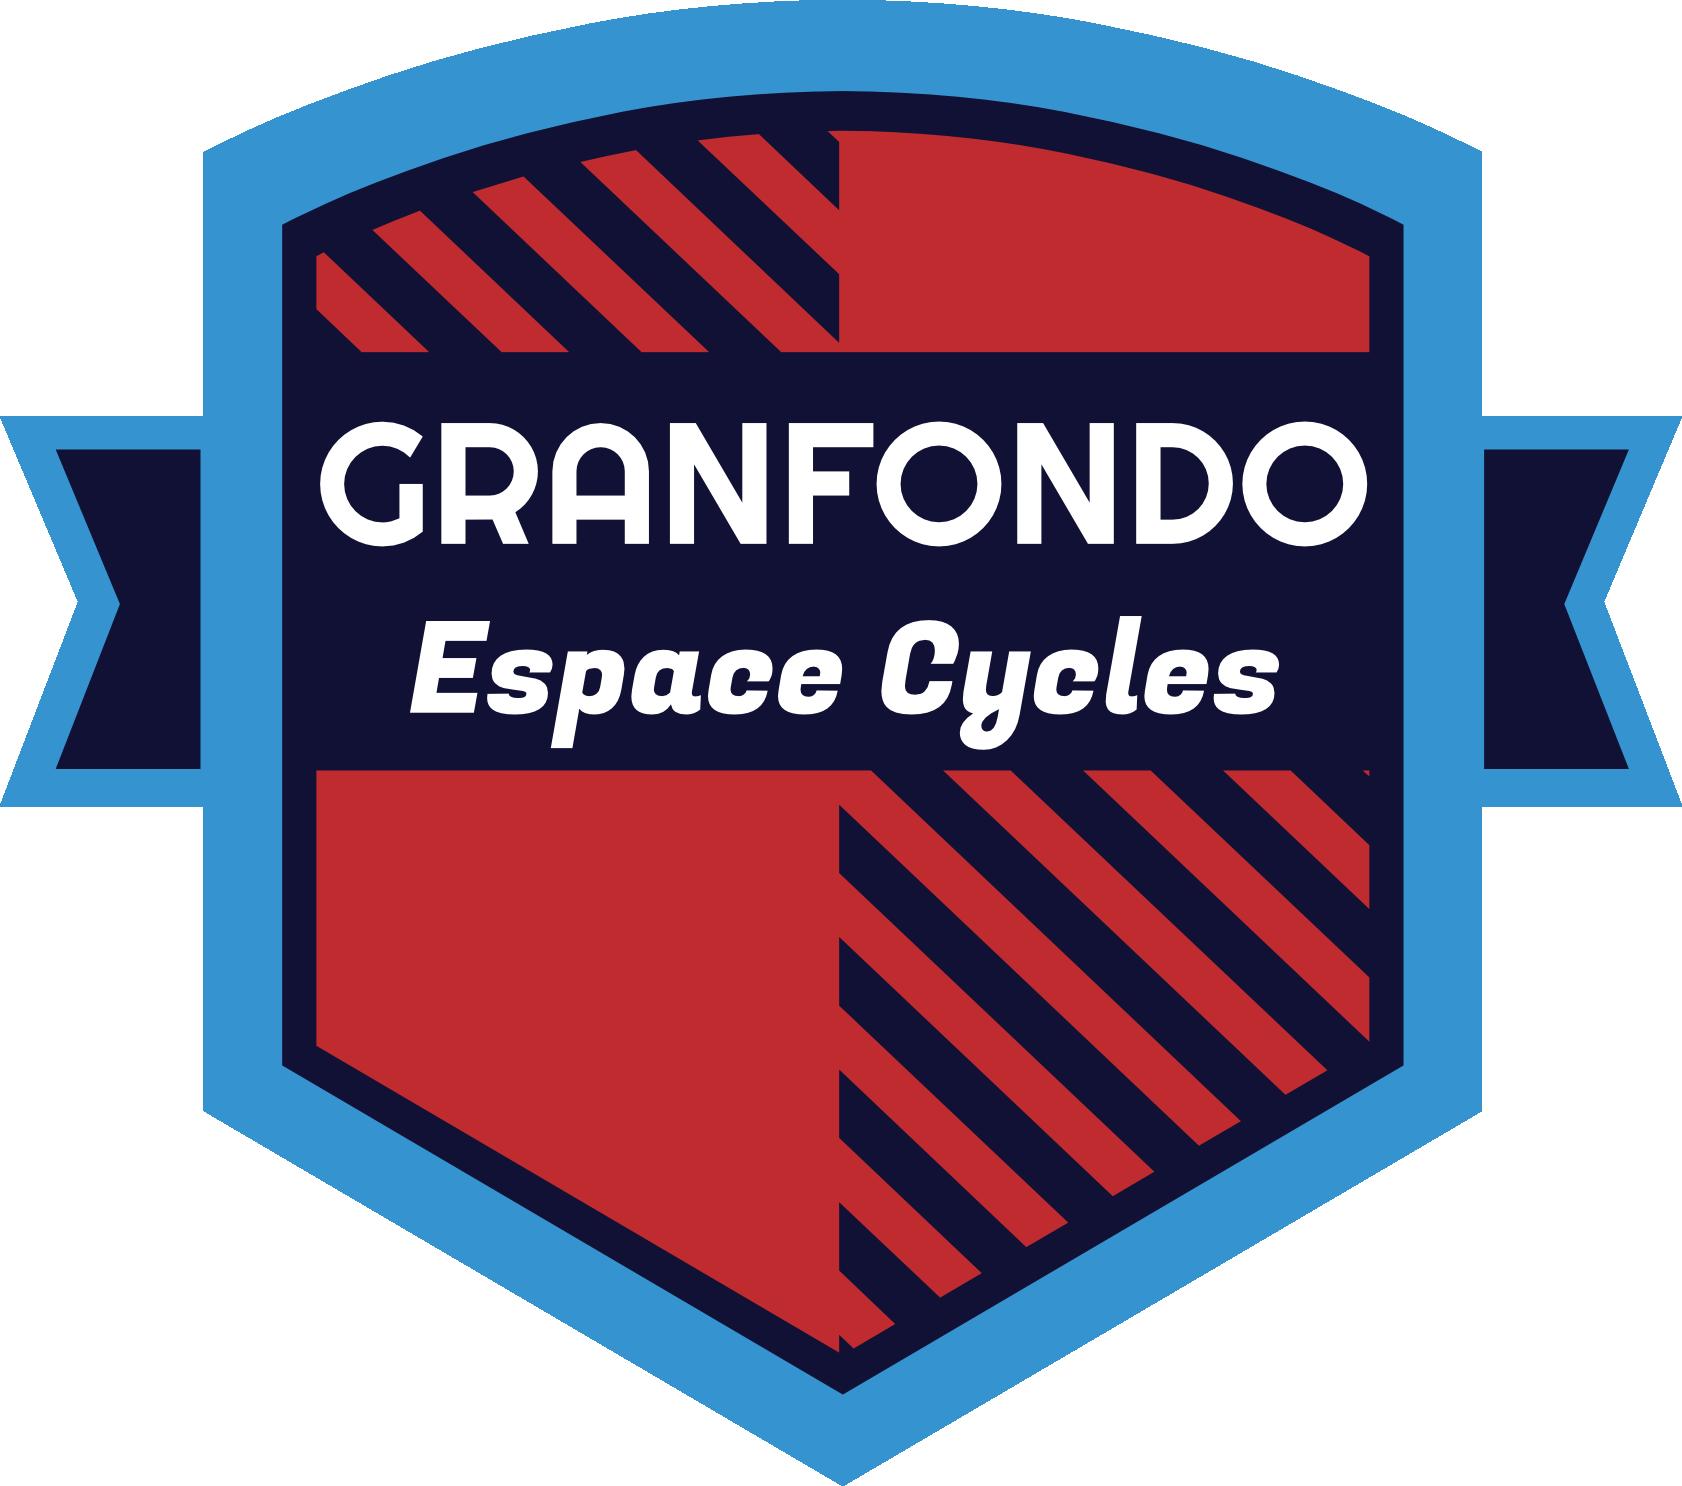 Granfondo Espace Cycles